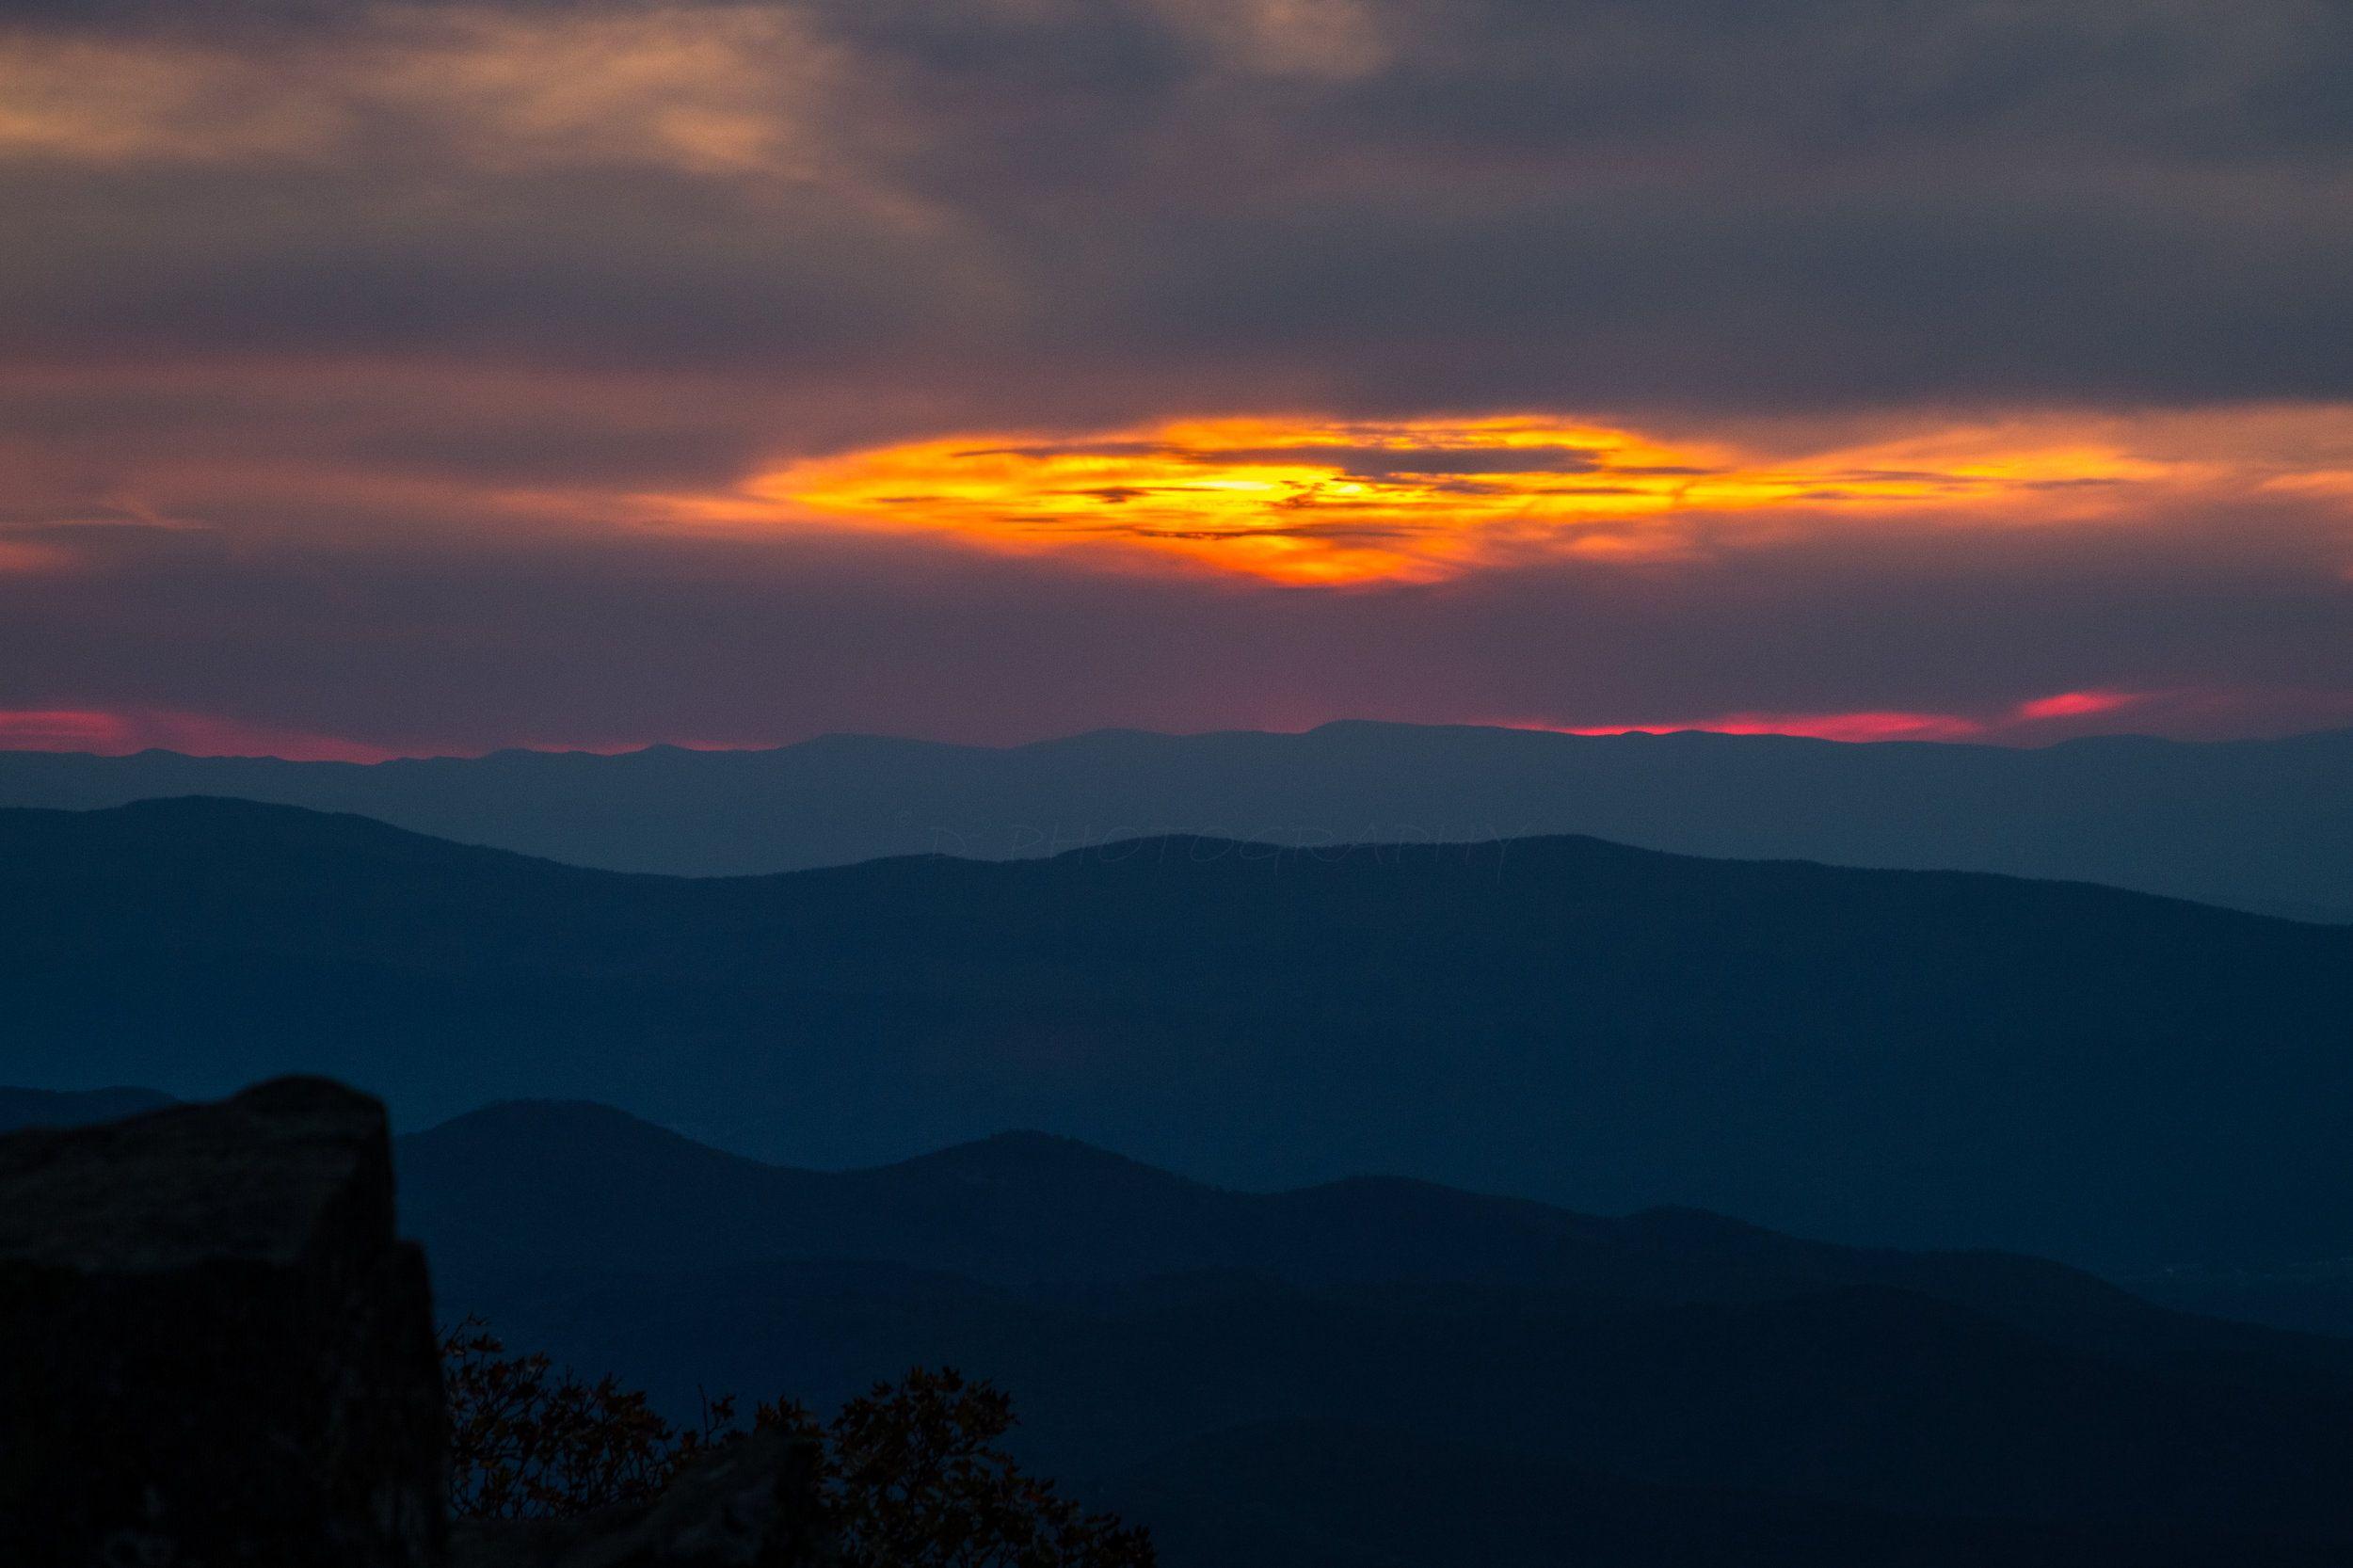 A sunset in shenandoah national park d2 photo art best